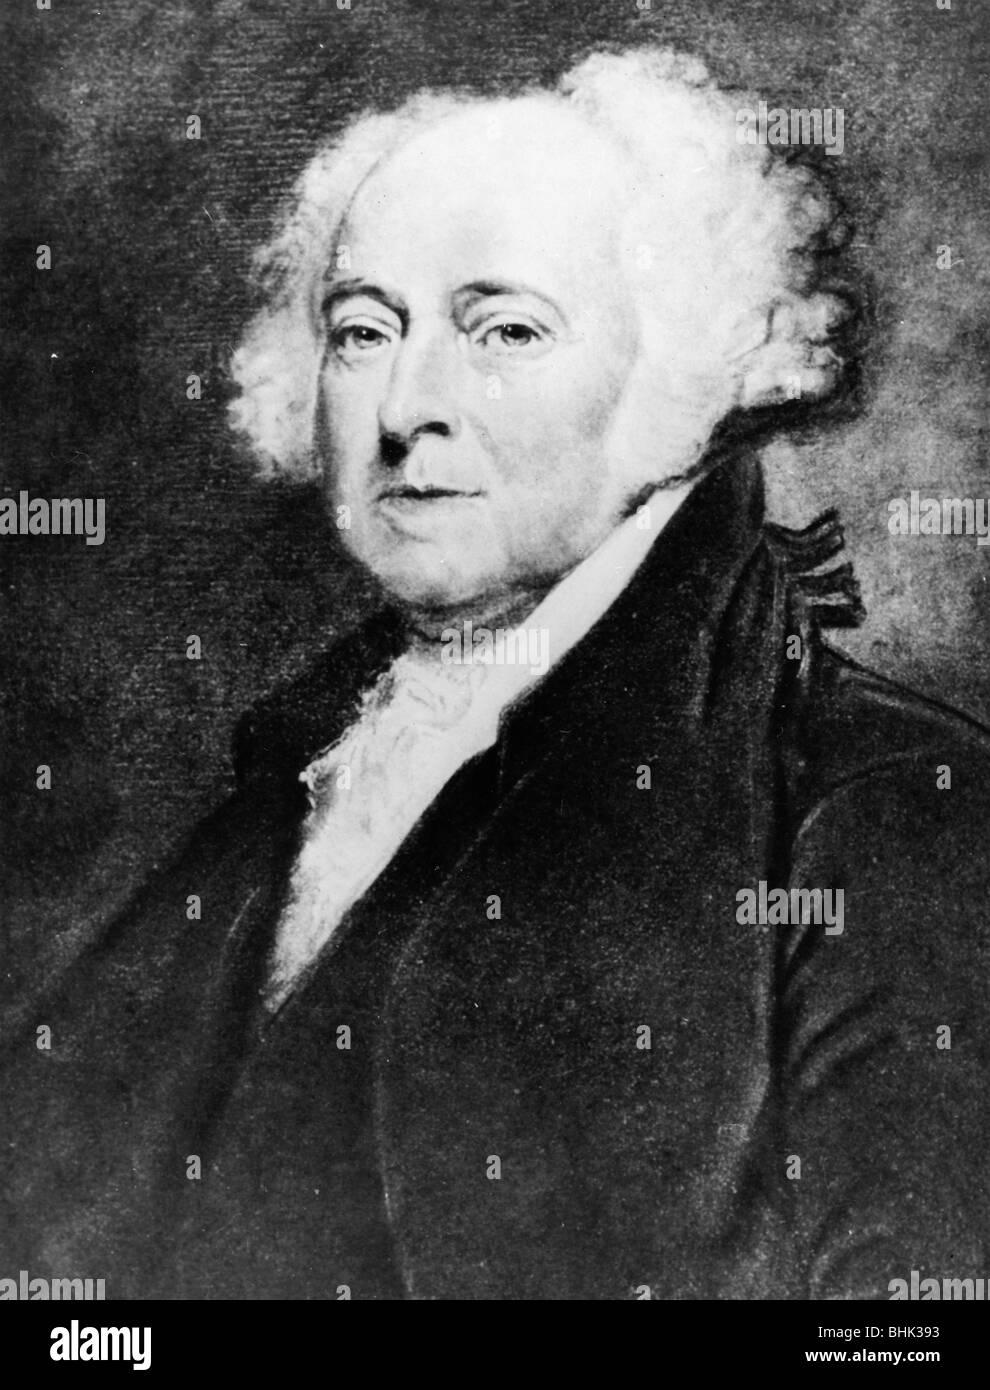 John Adams 1735-1826 Three-man portrait 1797-1801 the second president of the United States.